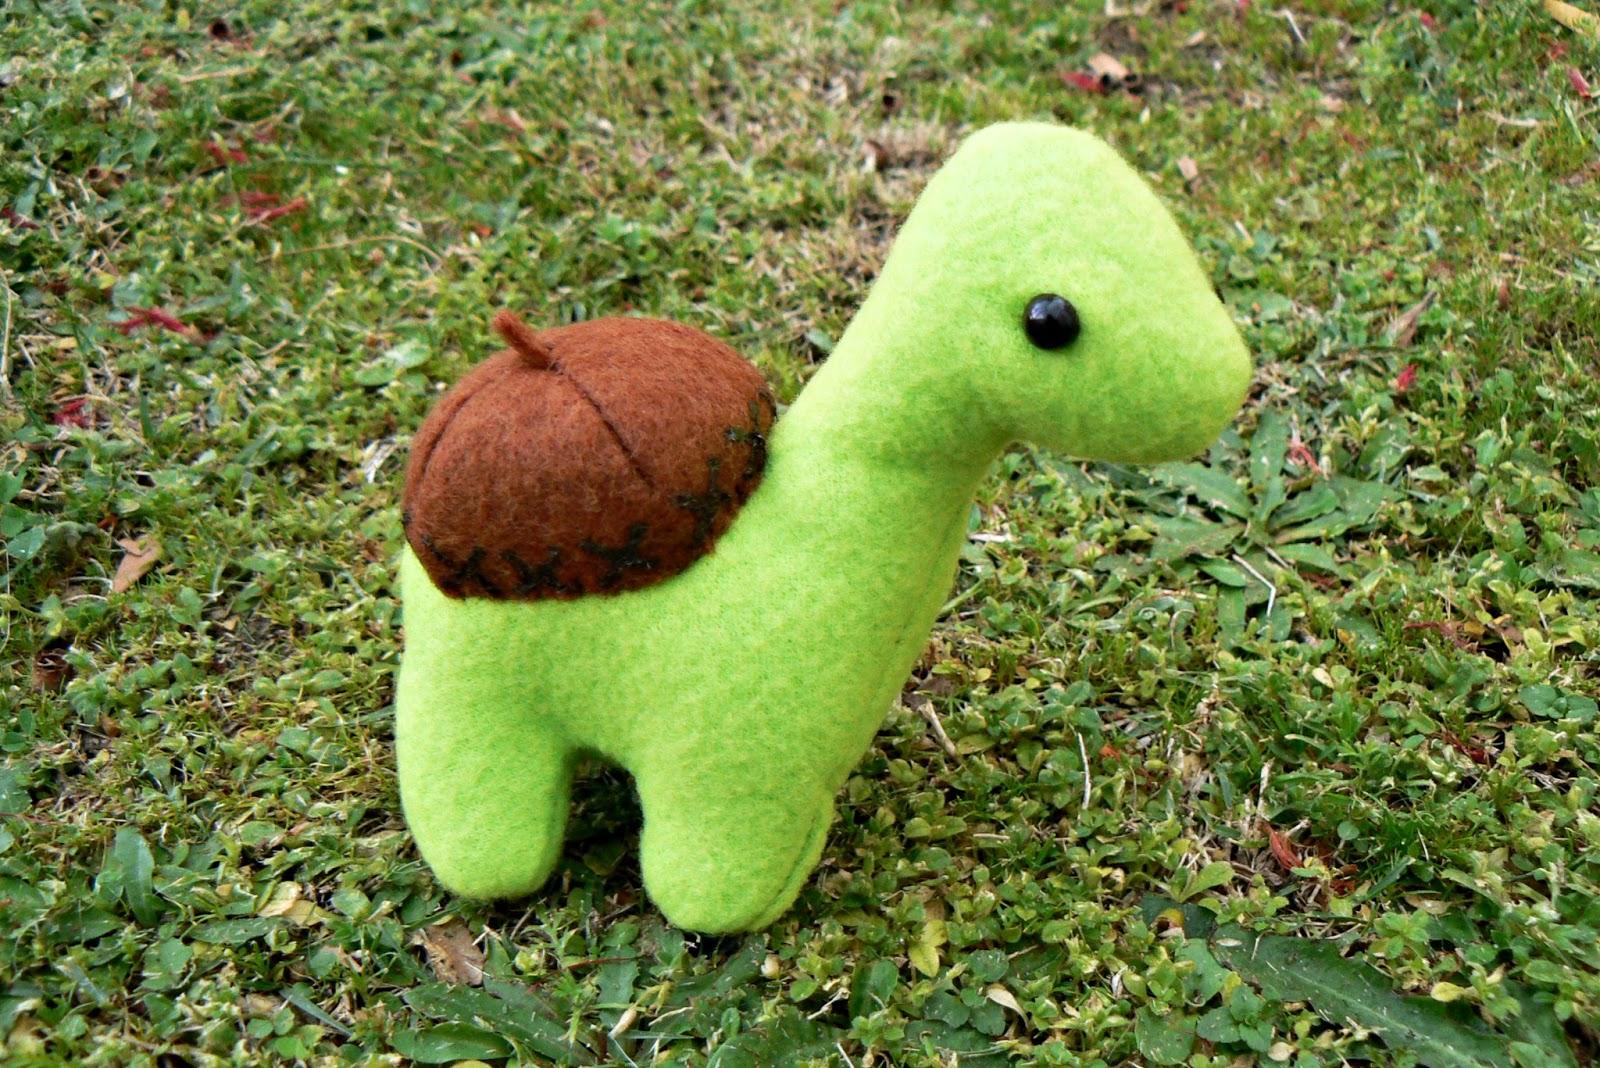 LDP: Sheldon the Dinosaur Plush DIY